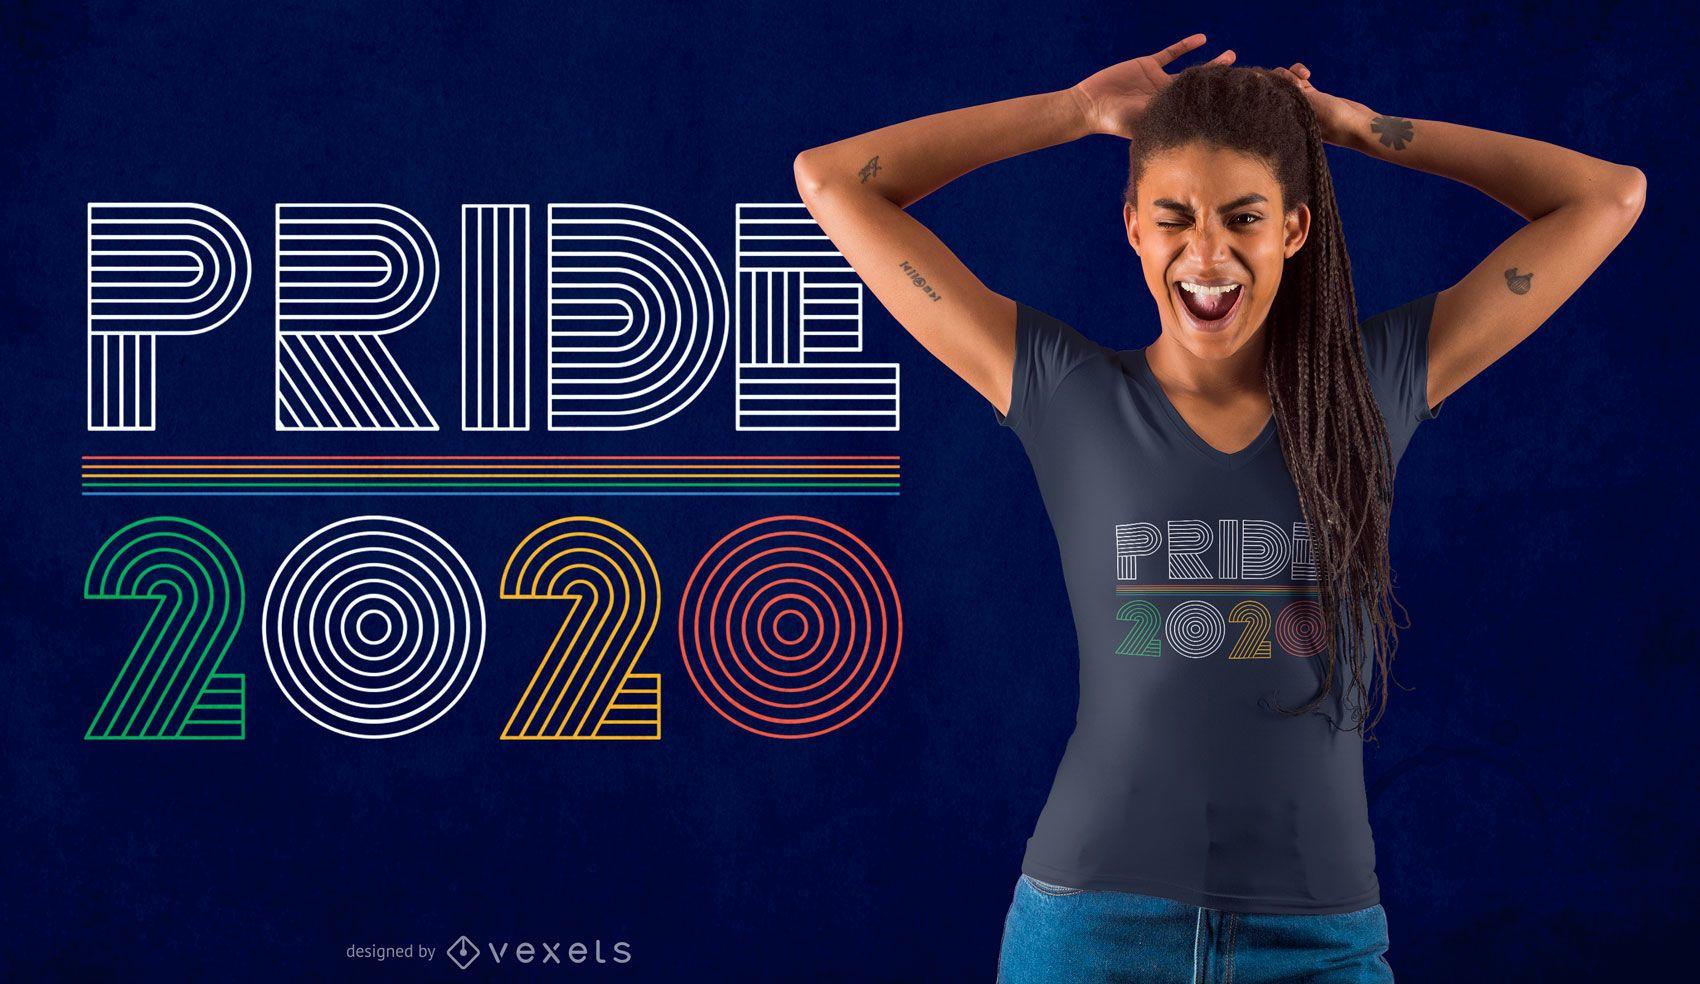 Pride 2020 t-shirt design